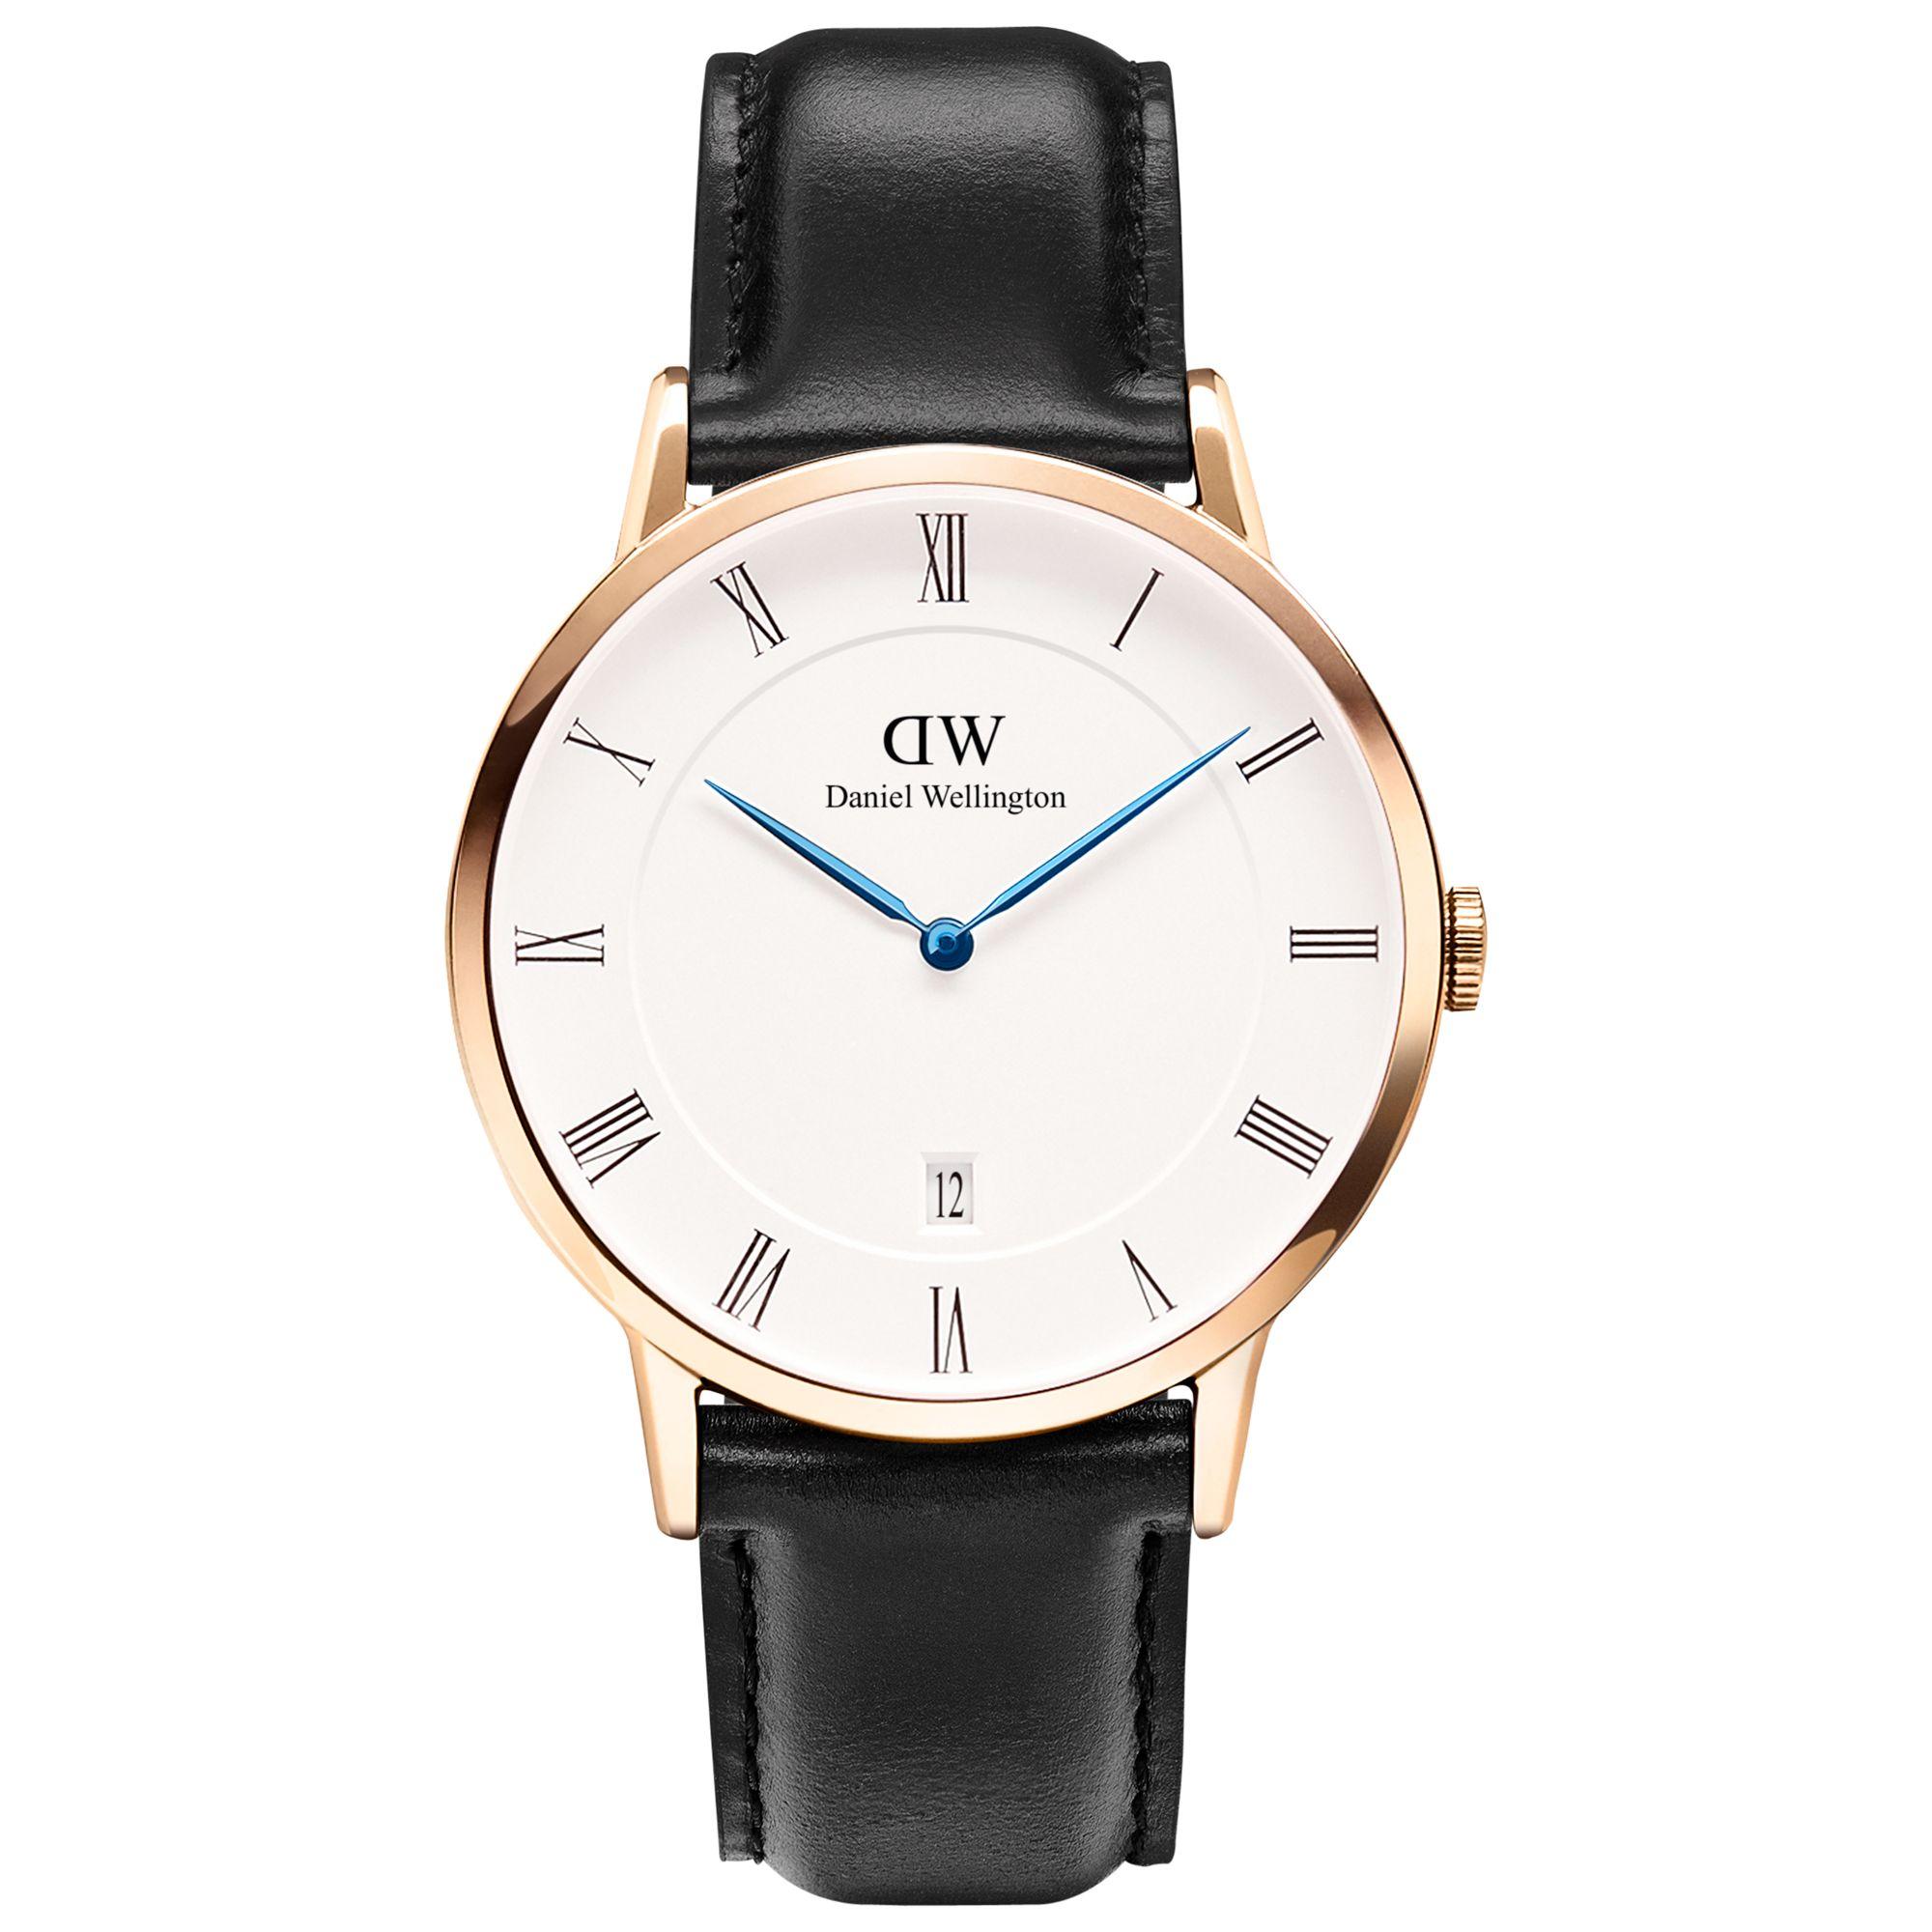 Daniel Wellington Daniel Wellington 1101DW Unisex Dapper Leather Strap Watch, Black/White